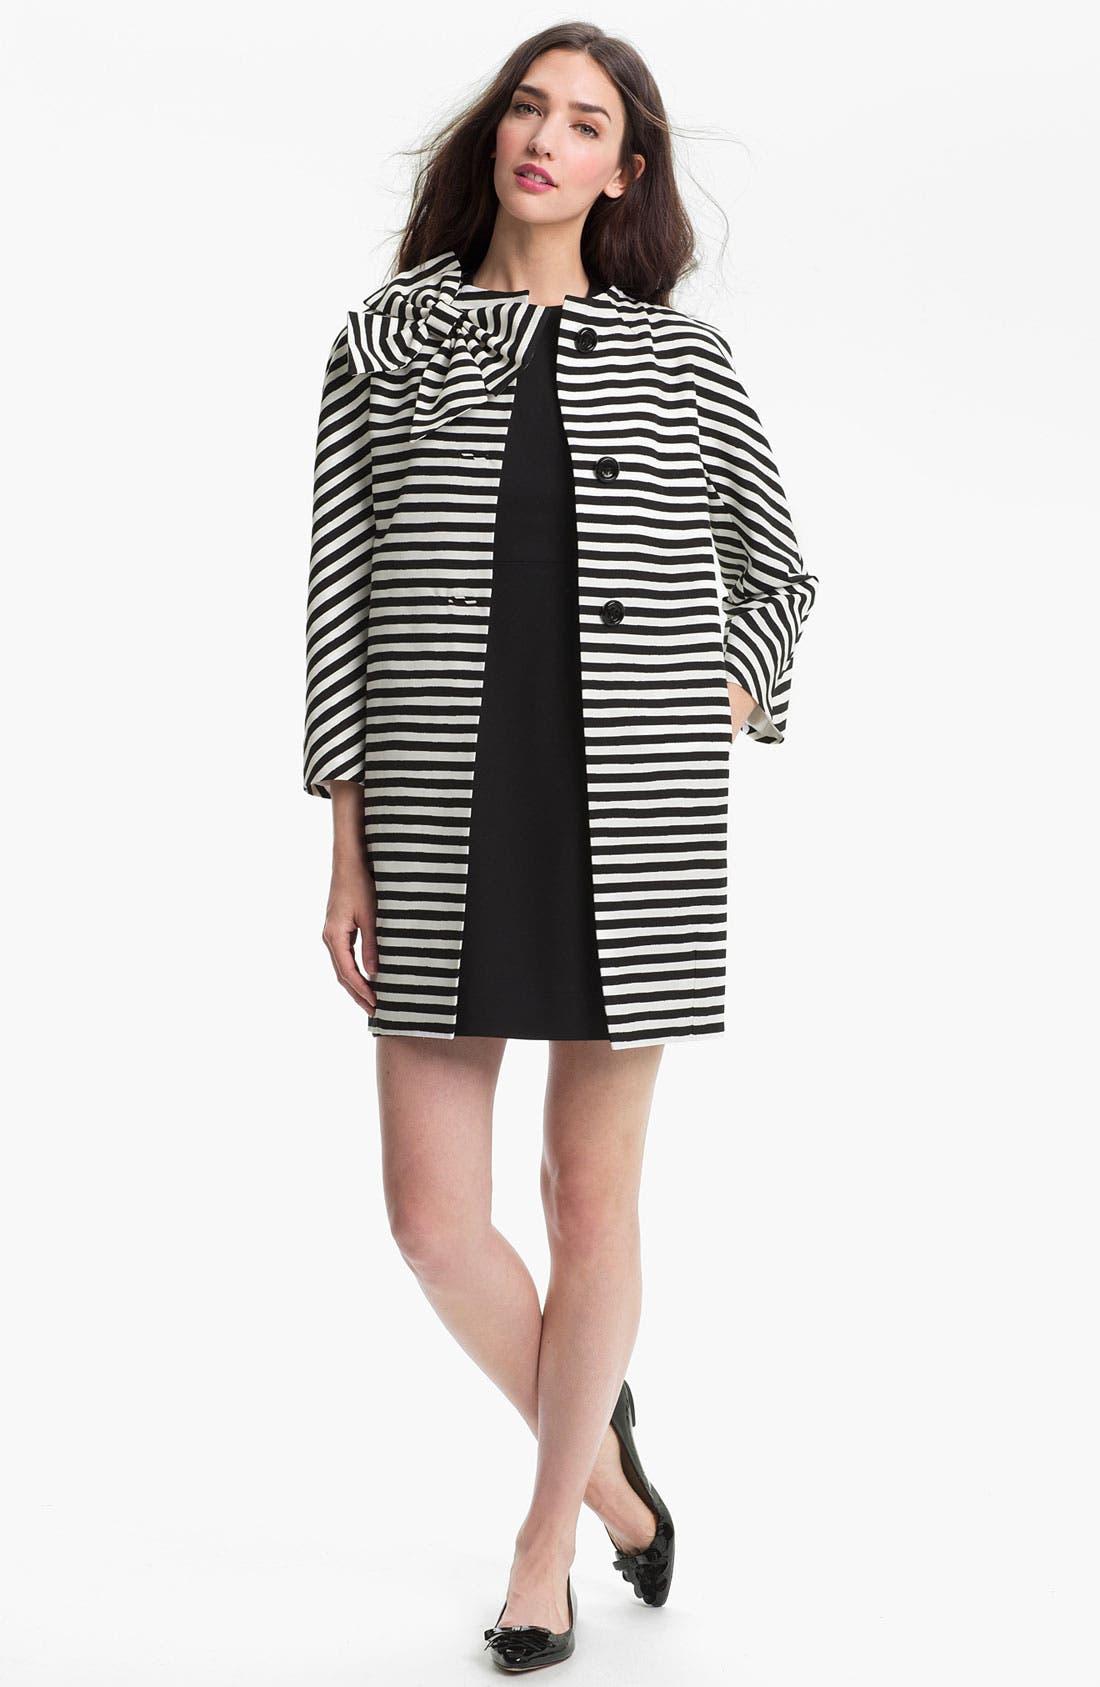 Alternate Image 1 Selected - kate spade new york 'dorothy' boxy coat